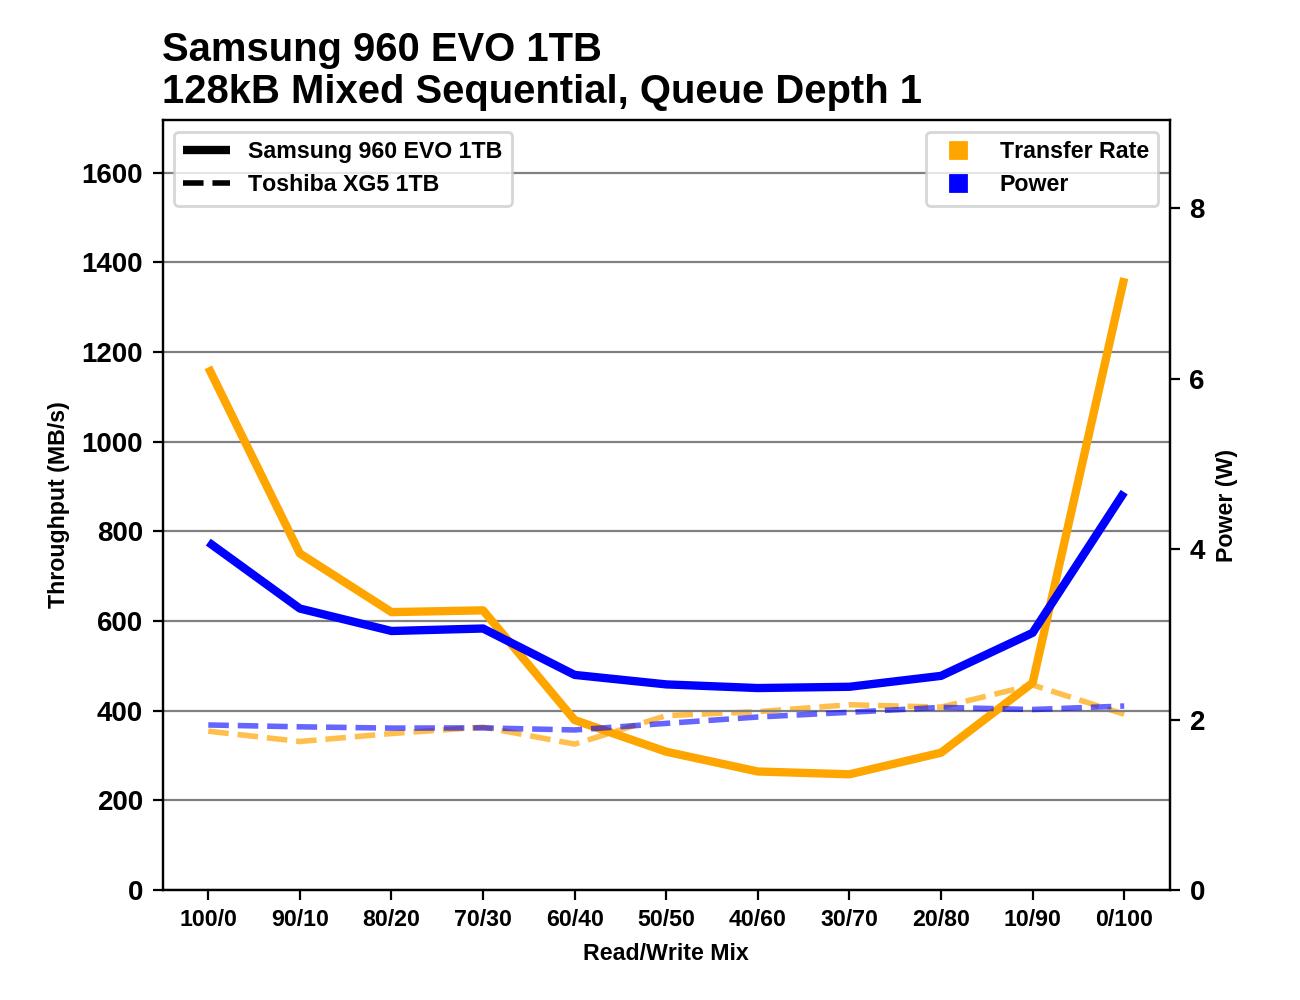 Mixed Read/Write Performance - The Toshiba XG5 (1TB) SSD Review